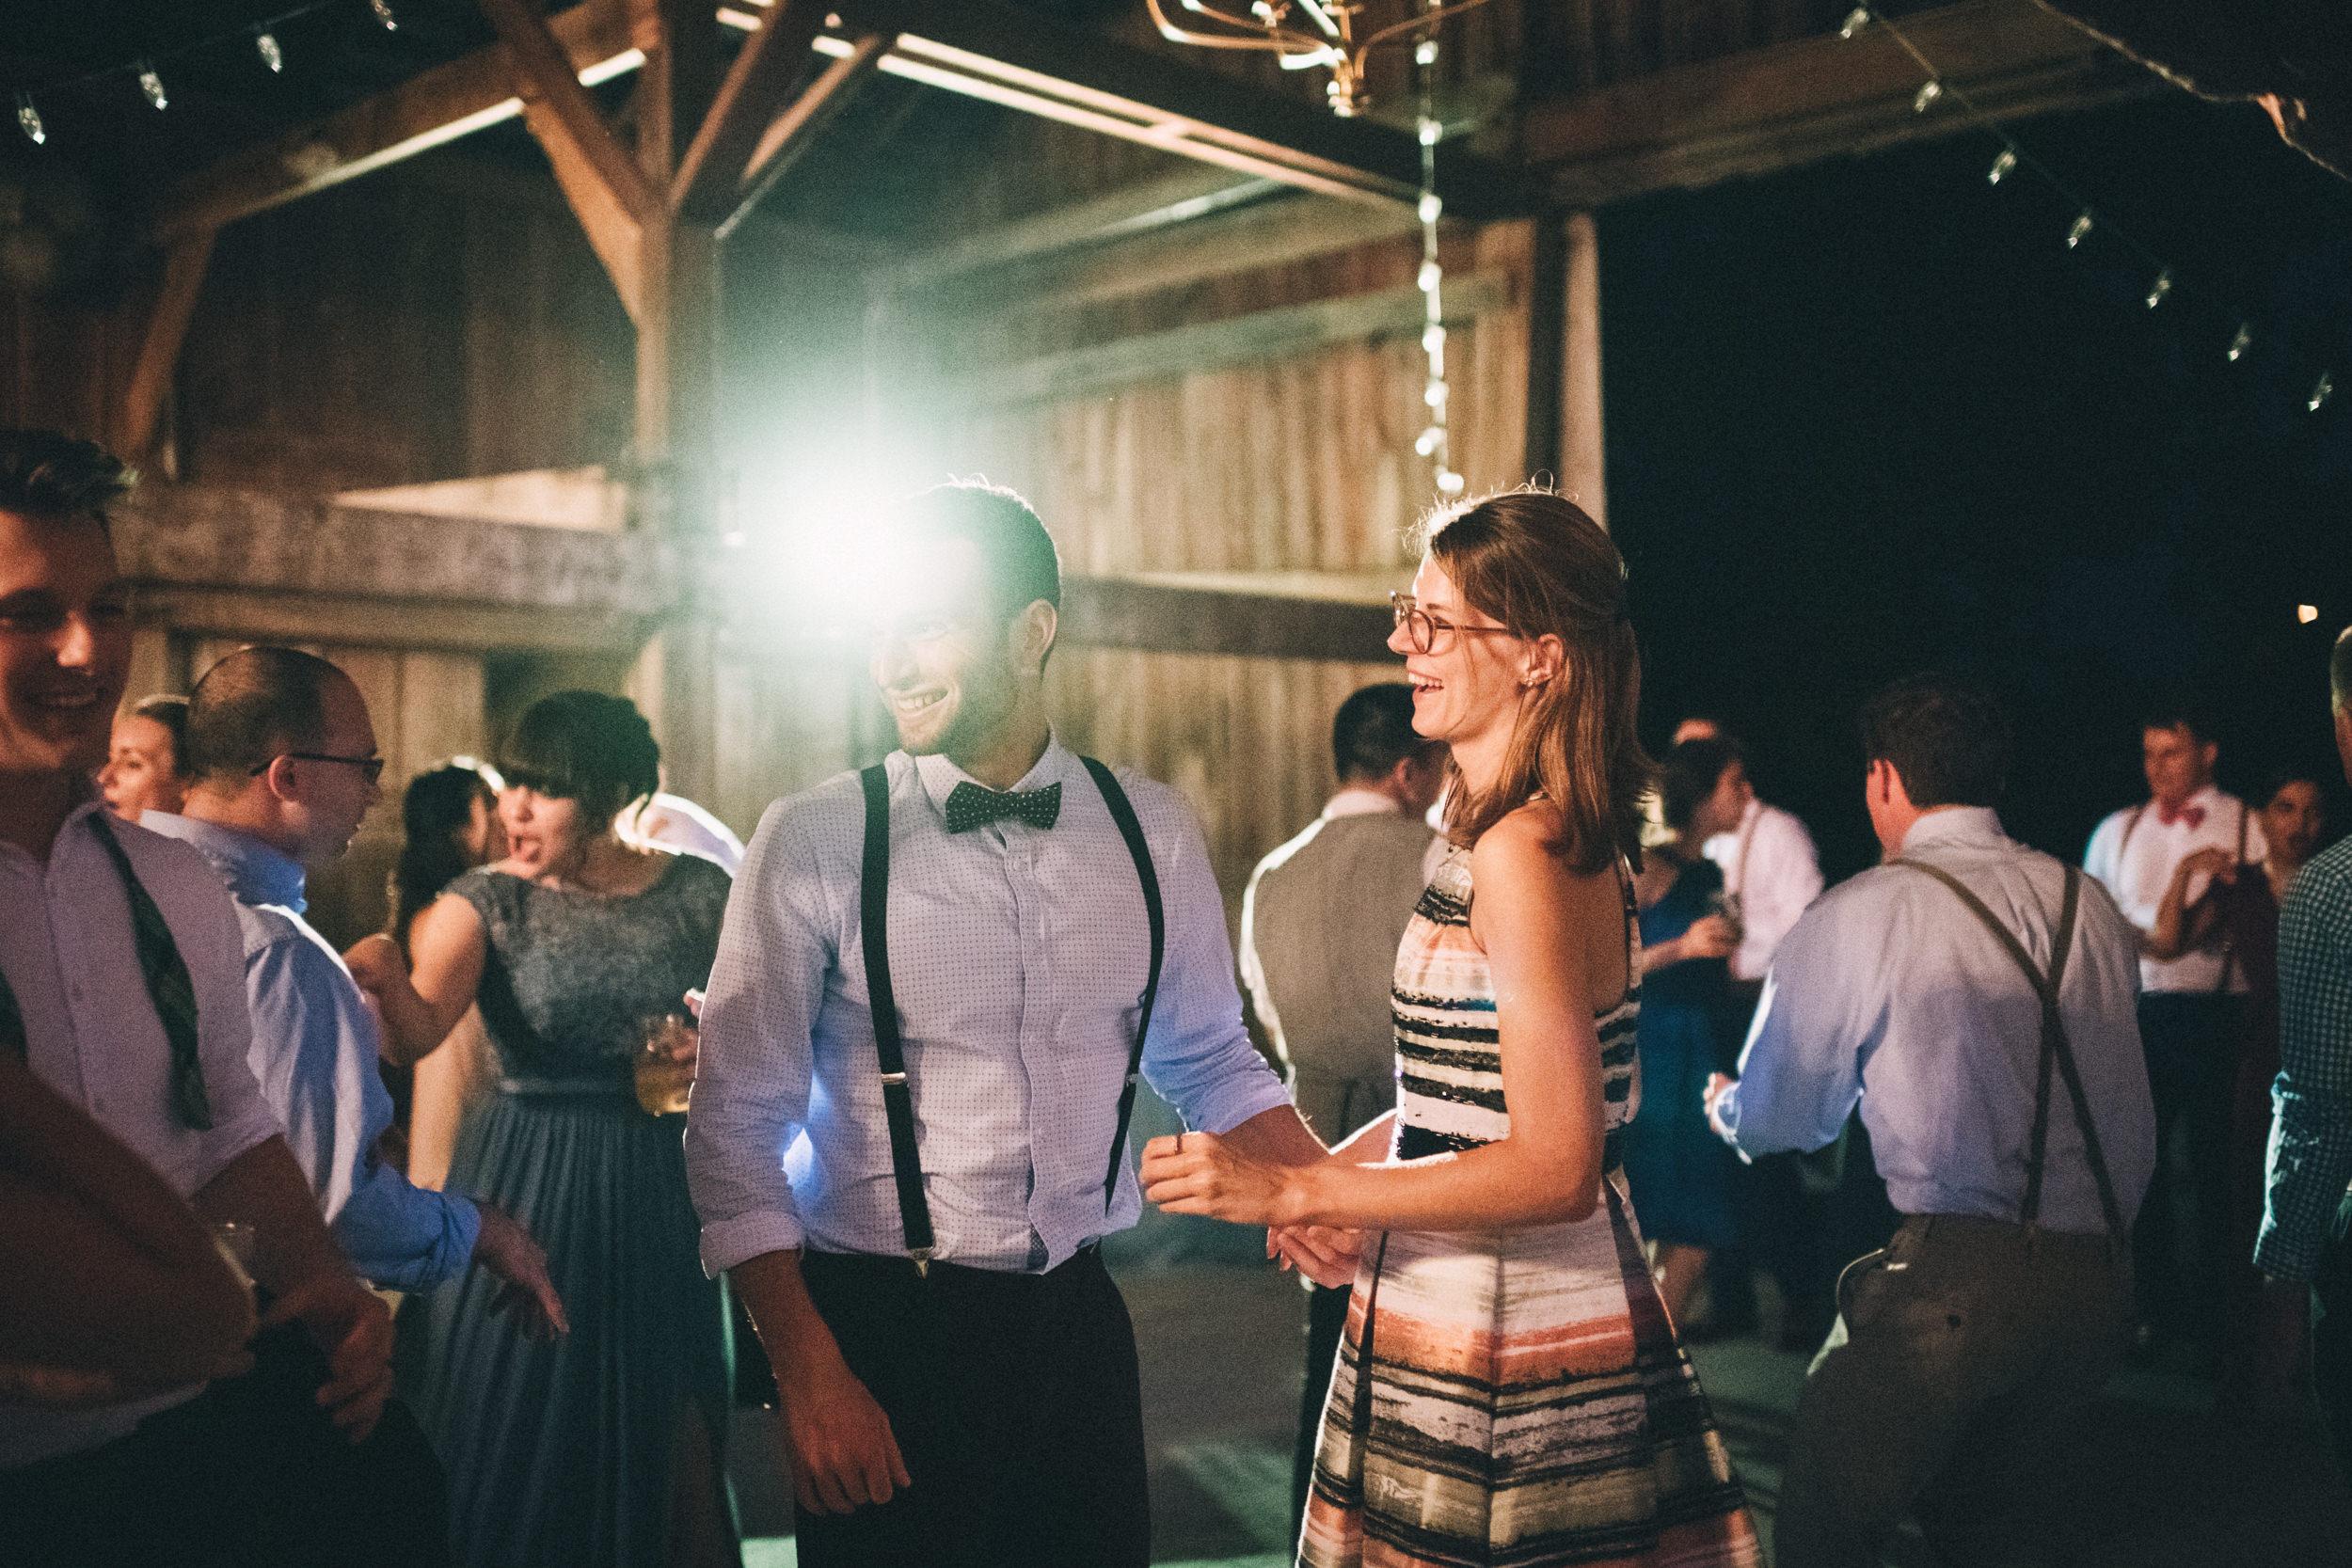 Louisville-Kentucky-Wedding-and-Elopement-Photographer-Sarah-Katherine-Davis-Photography-Summer-Jewel-Toned-Wedding-Chineese-Tea-Ceremony-Warrenwood-Manor-Danville-1019.jpg